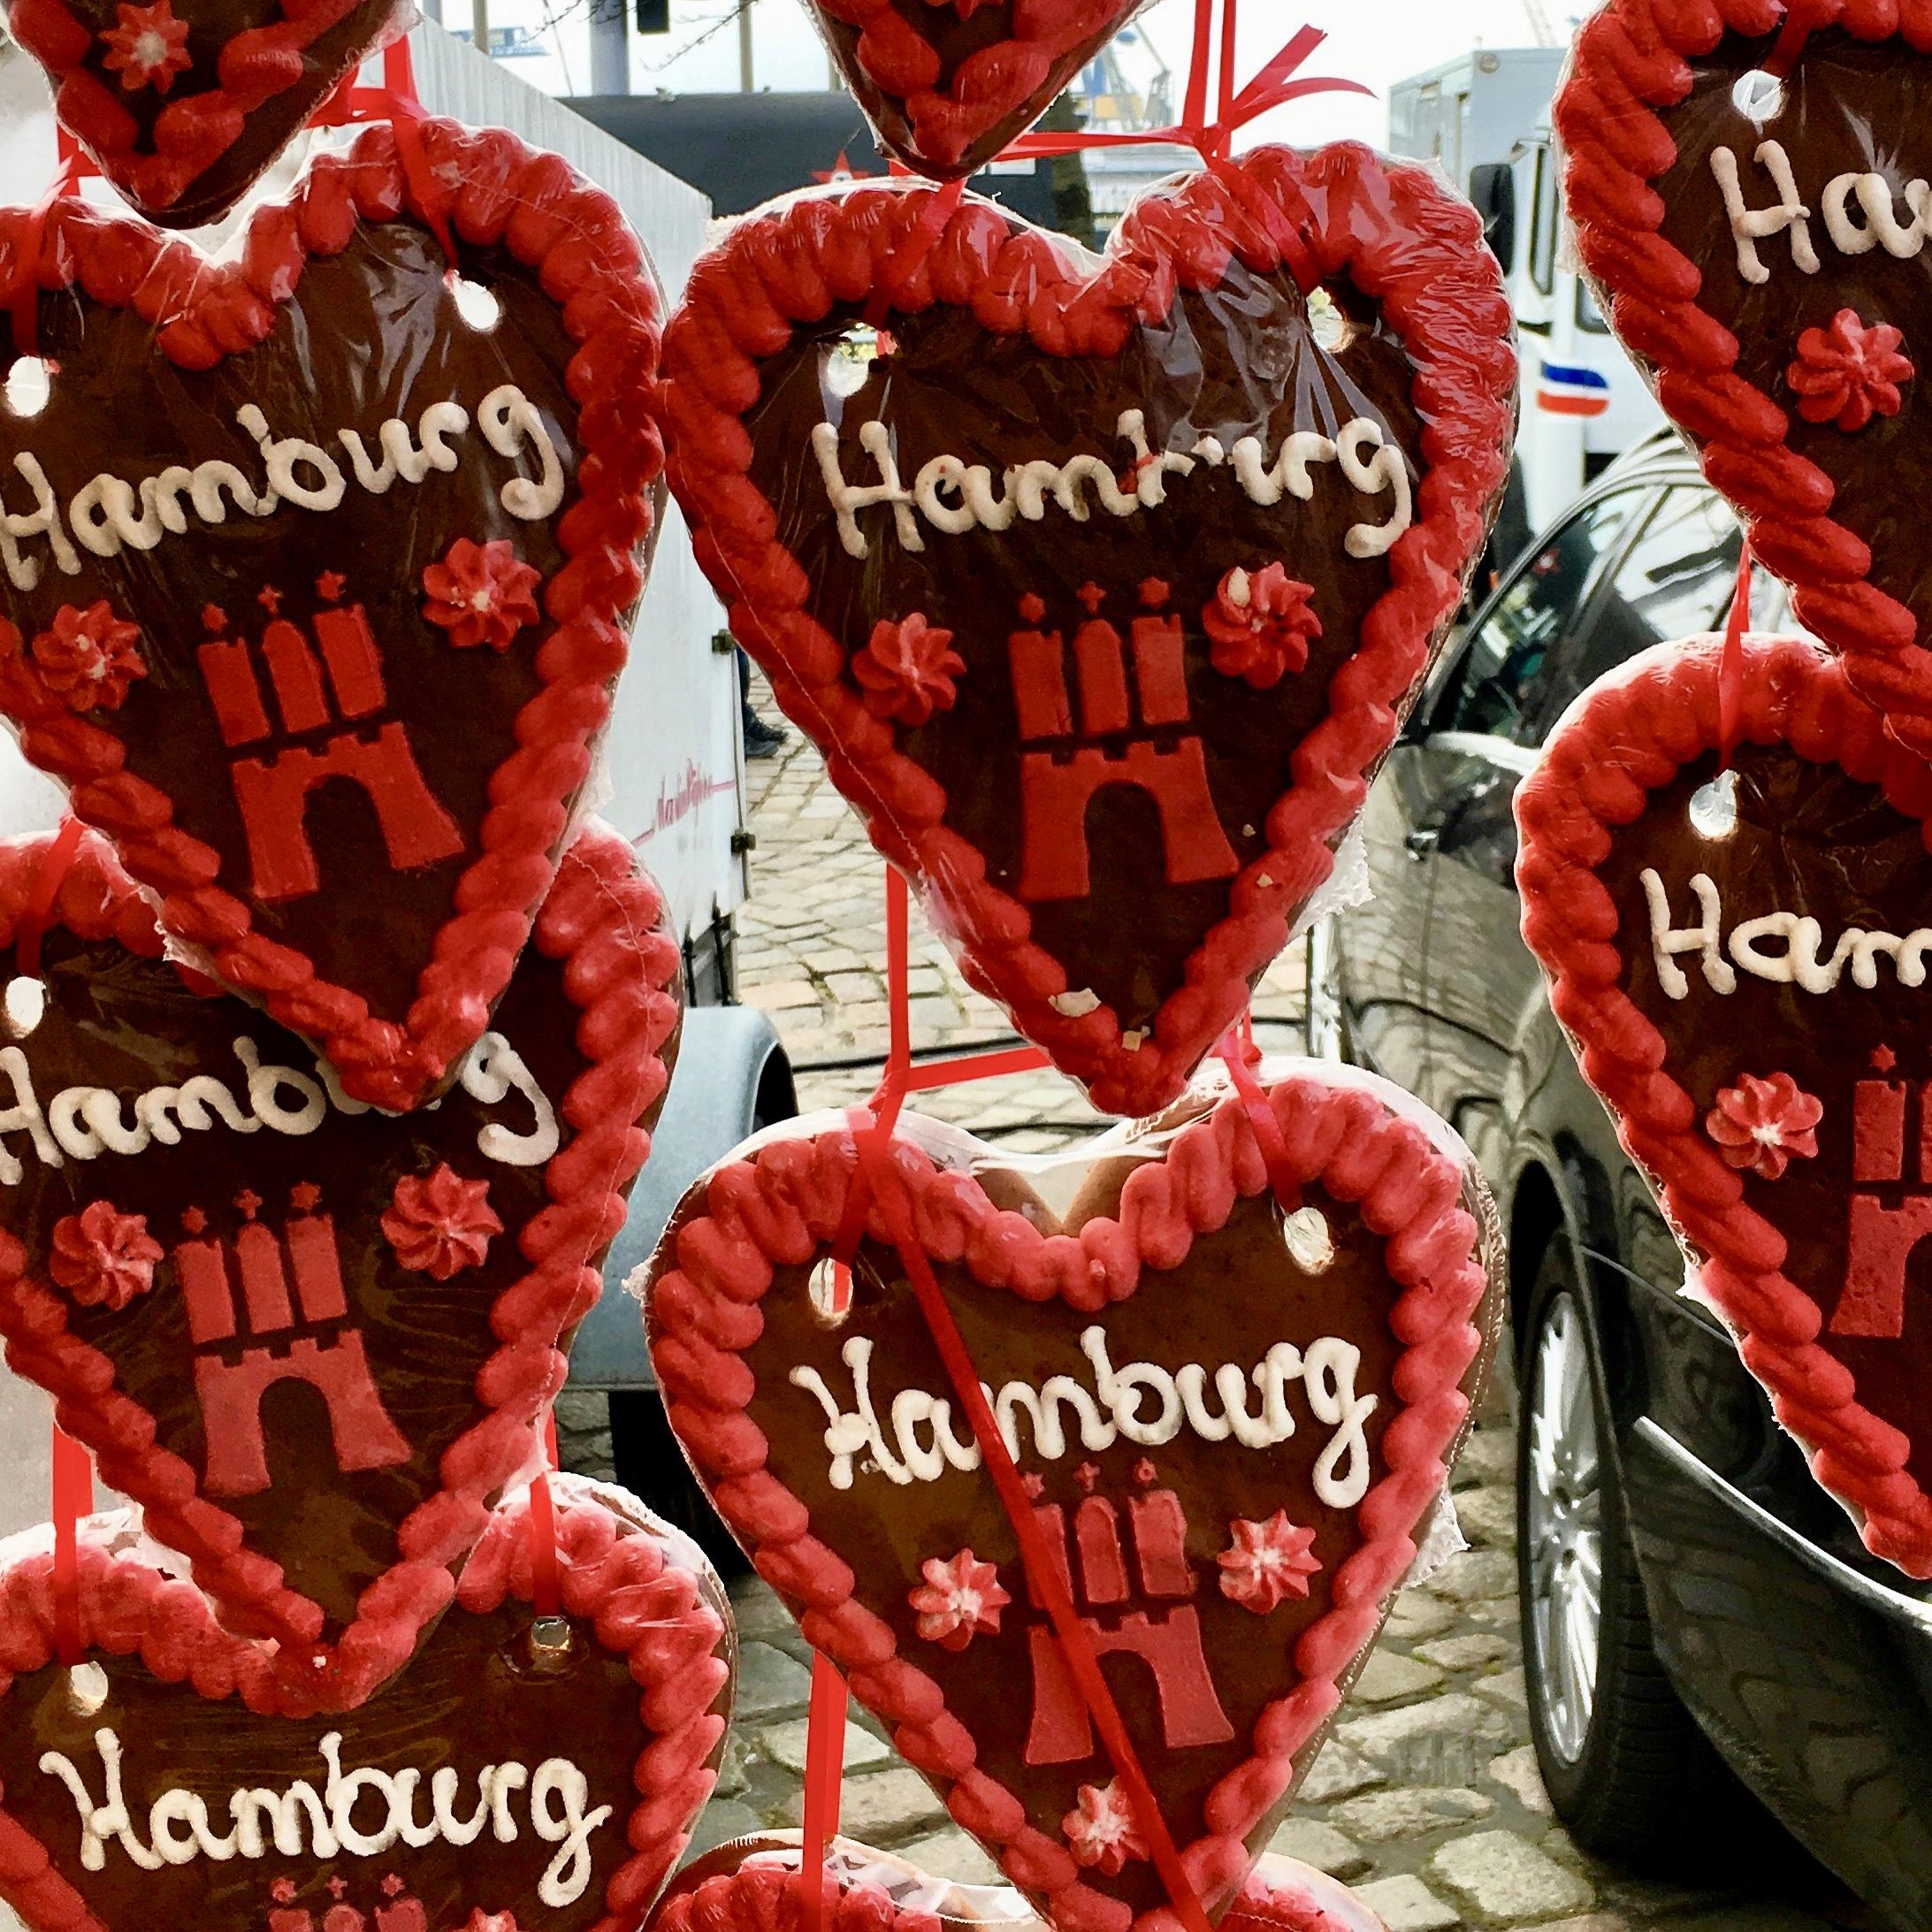 Loving Hamburg, especially where food's concerned